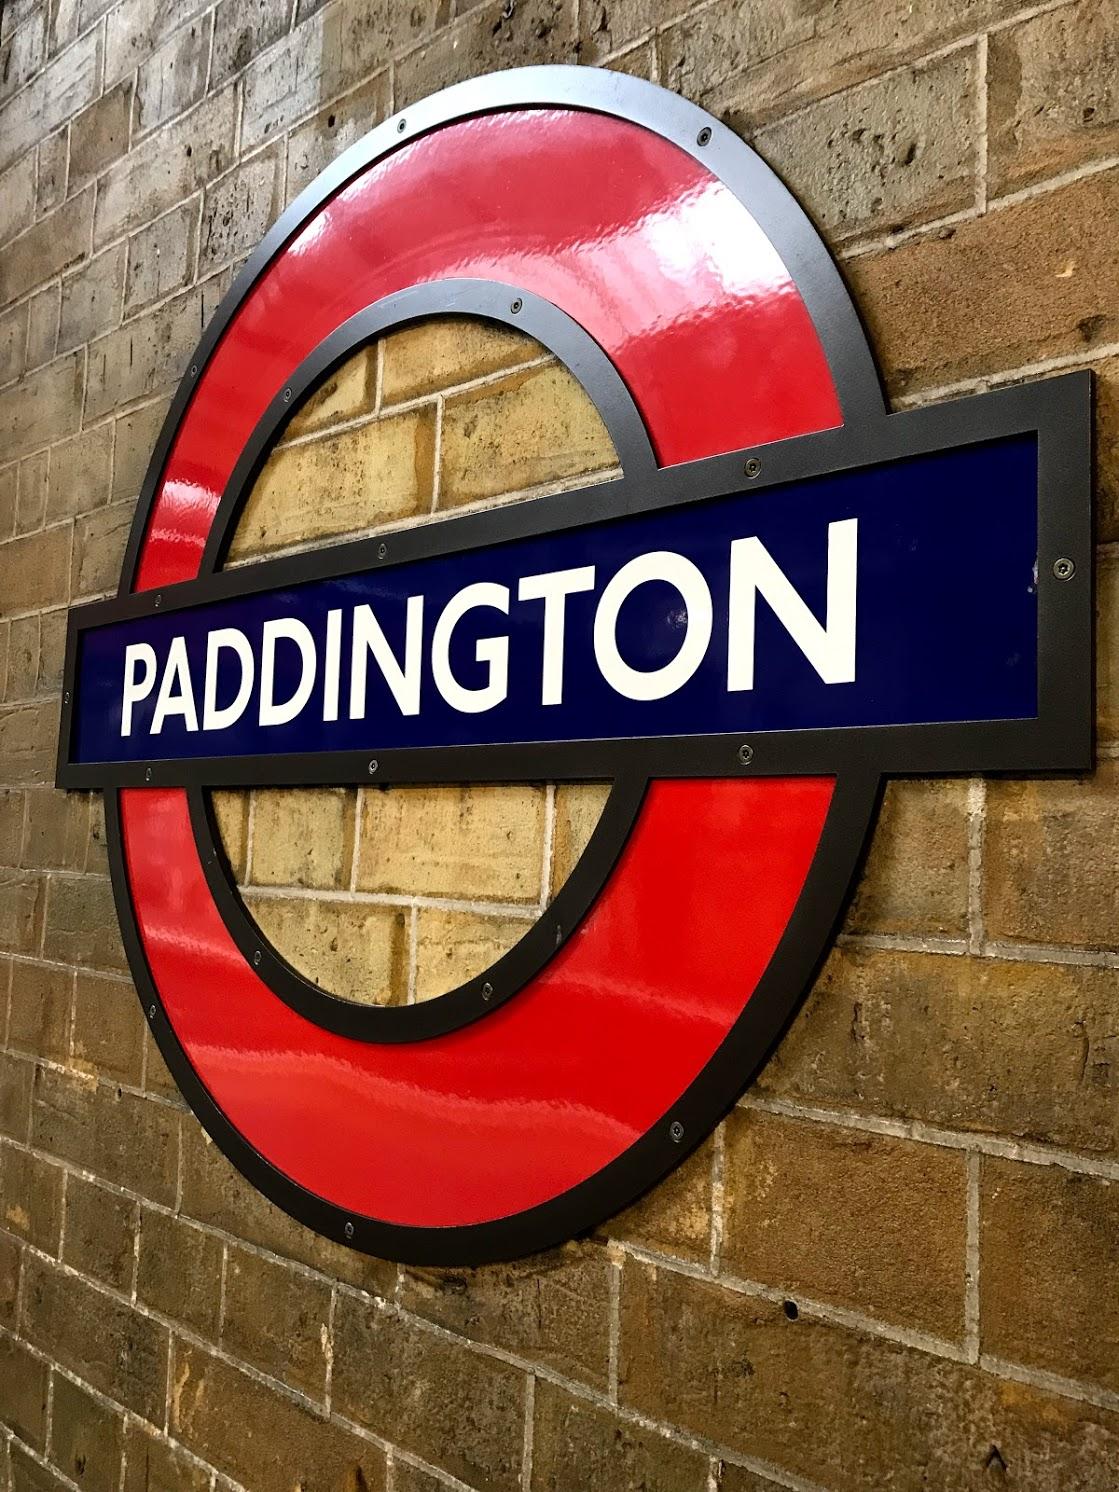 london tube paddington station sign.jpg